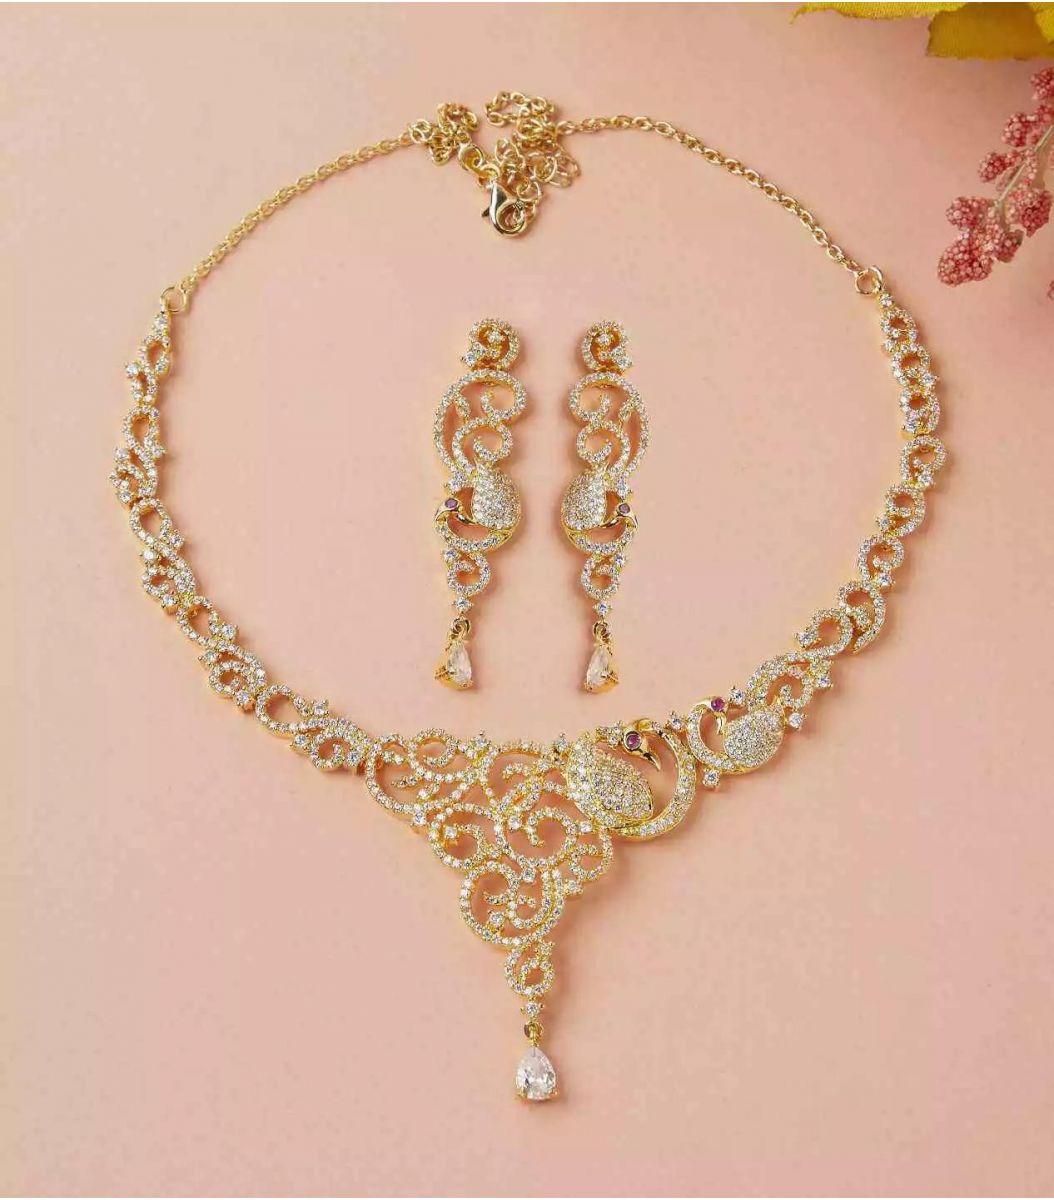 Silver Gold Polish Necklace FJ1660582